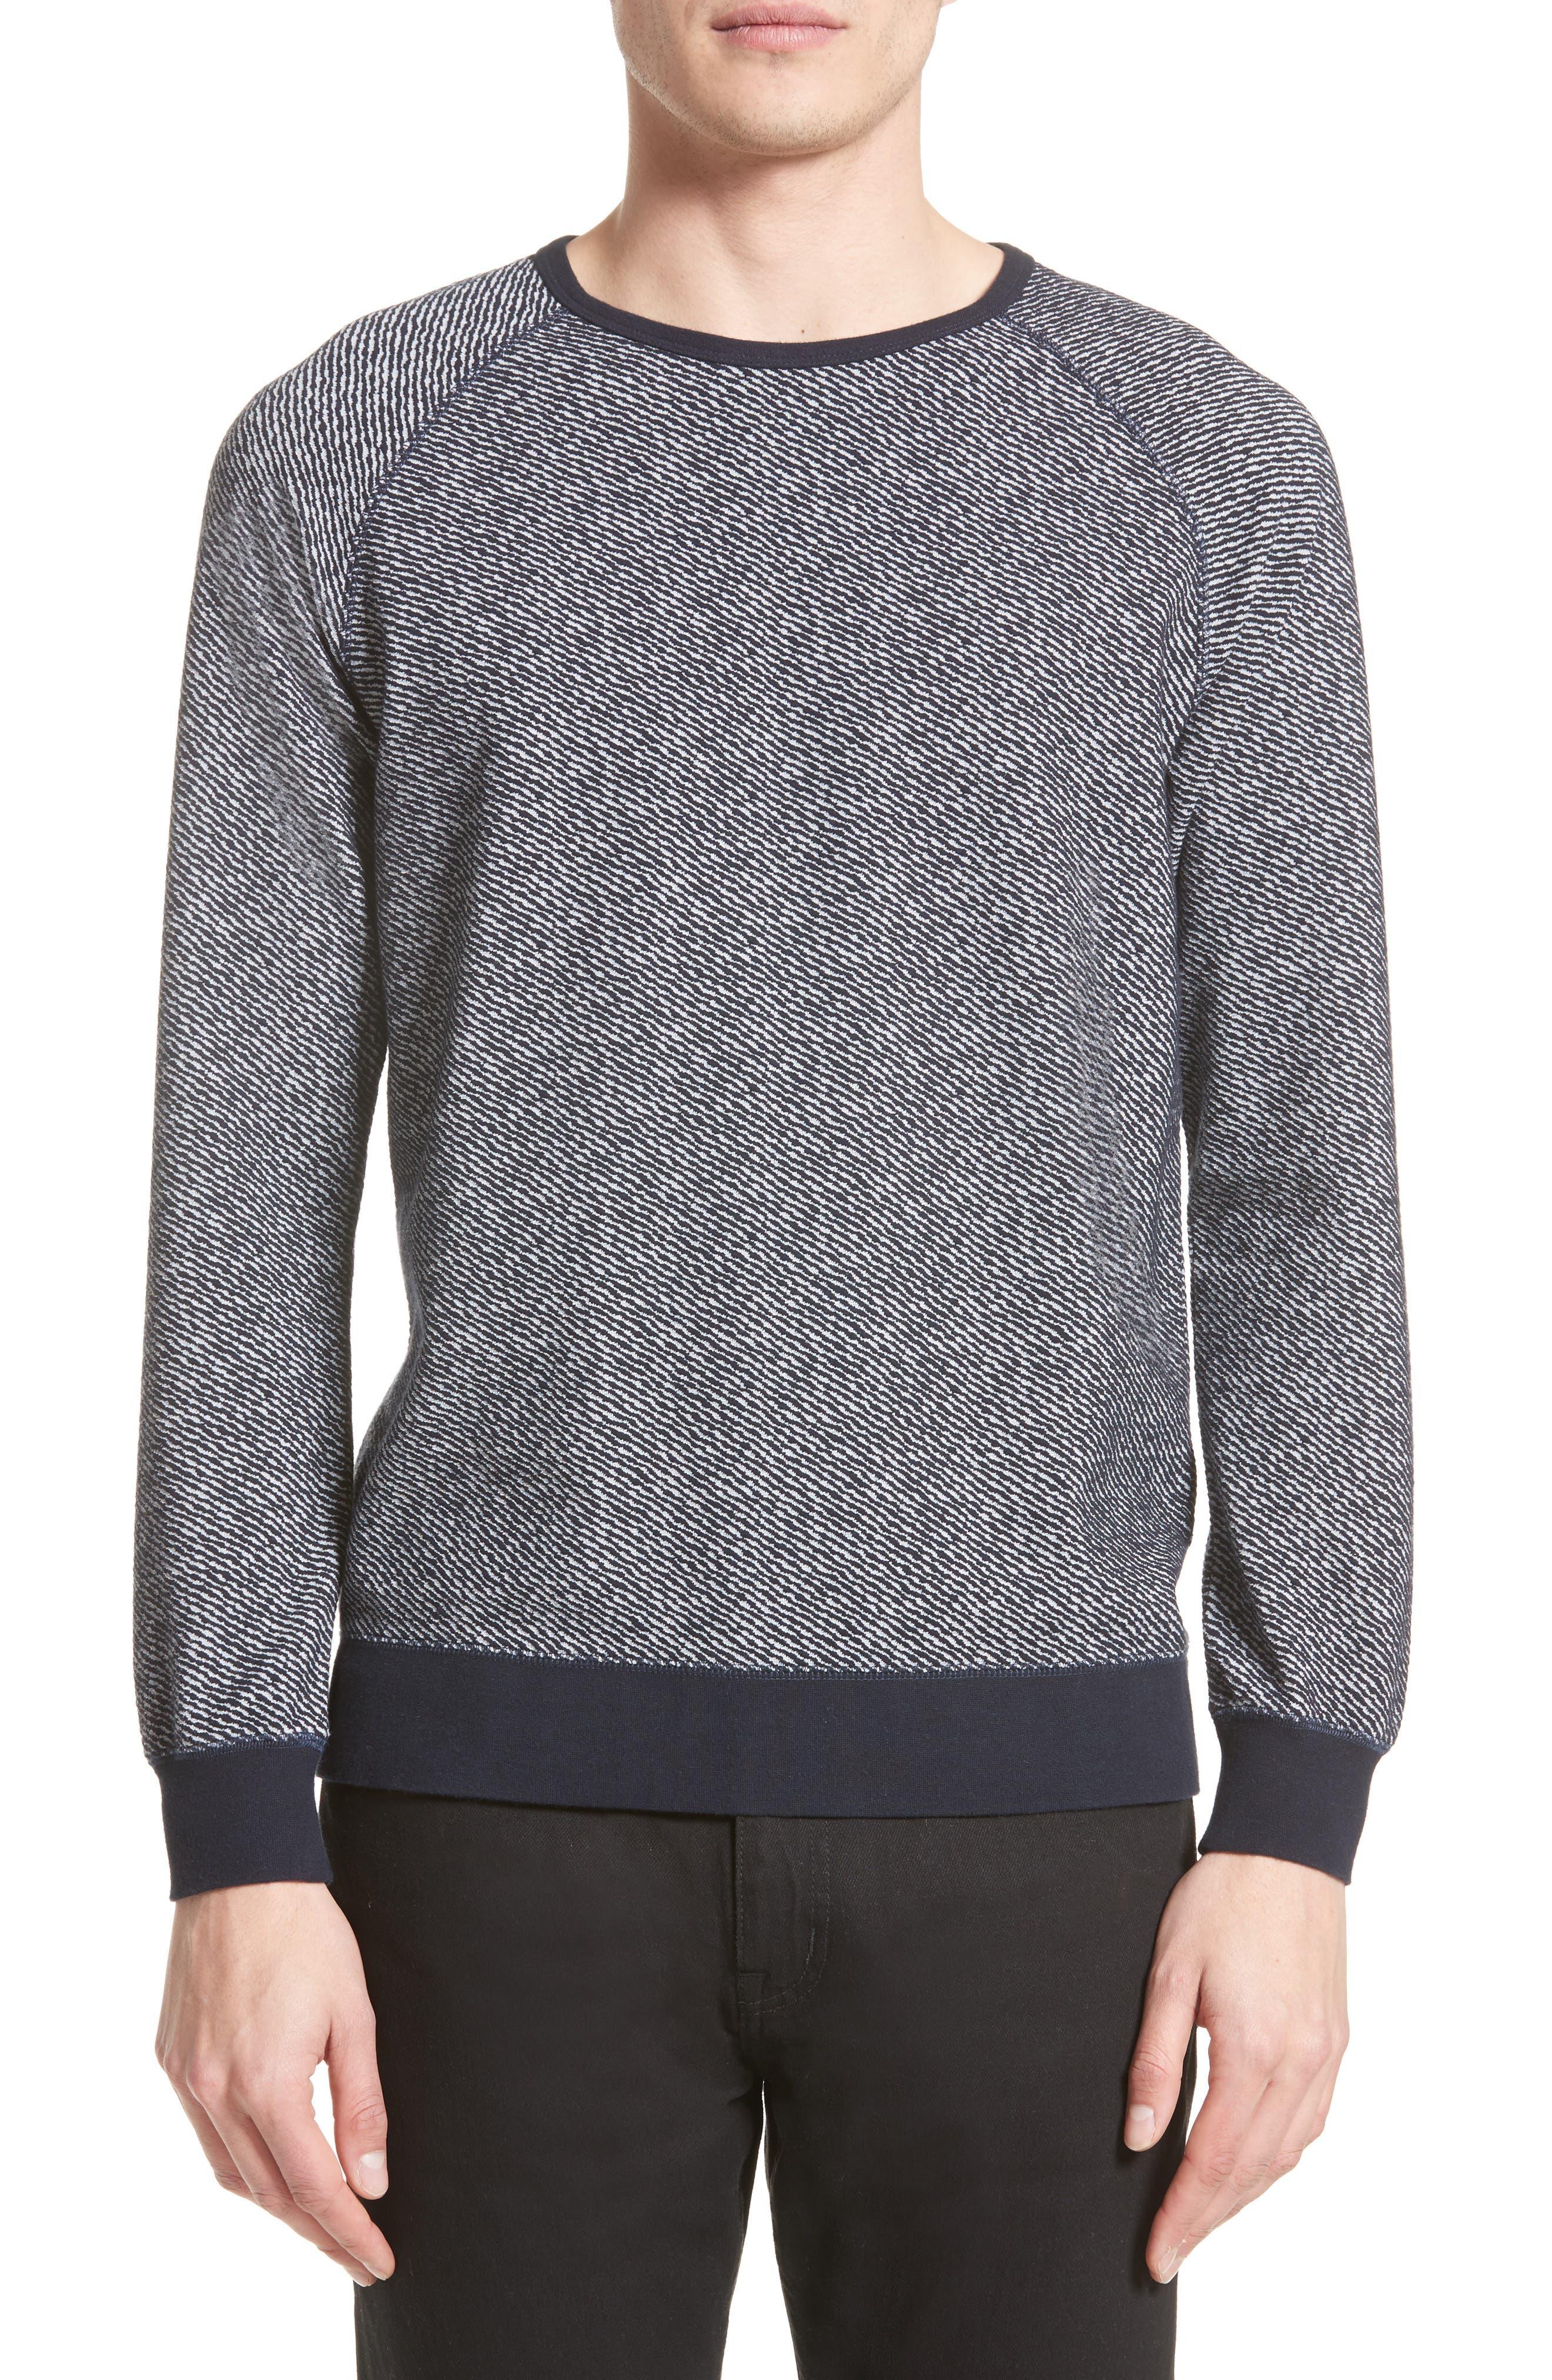 Kasu Sweater,                         Main,                         color, Midnight